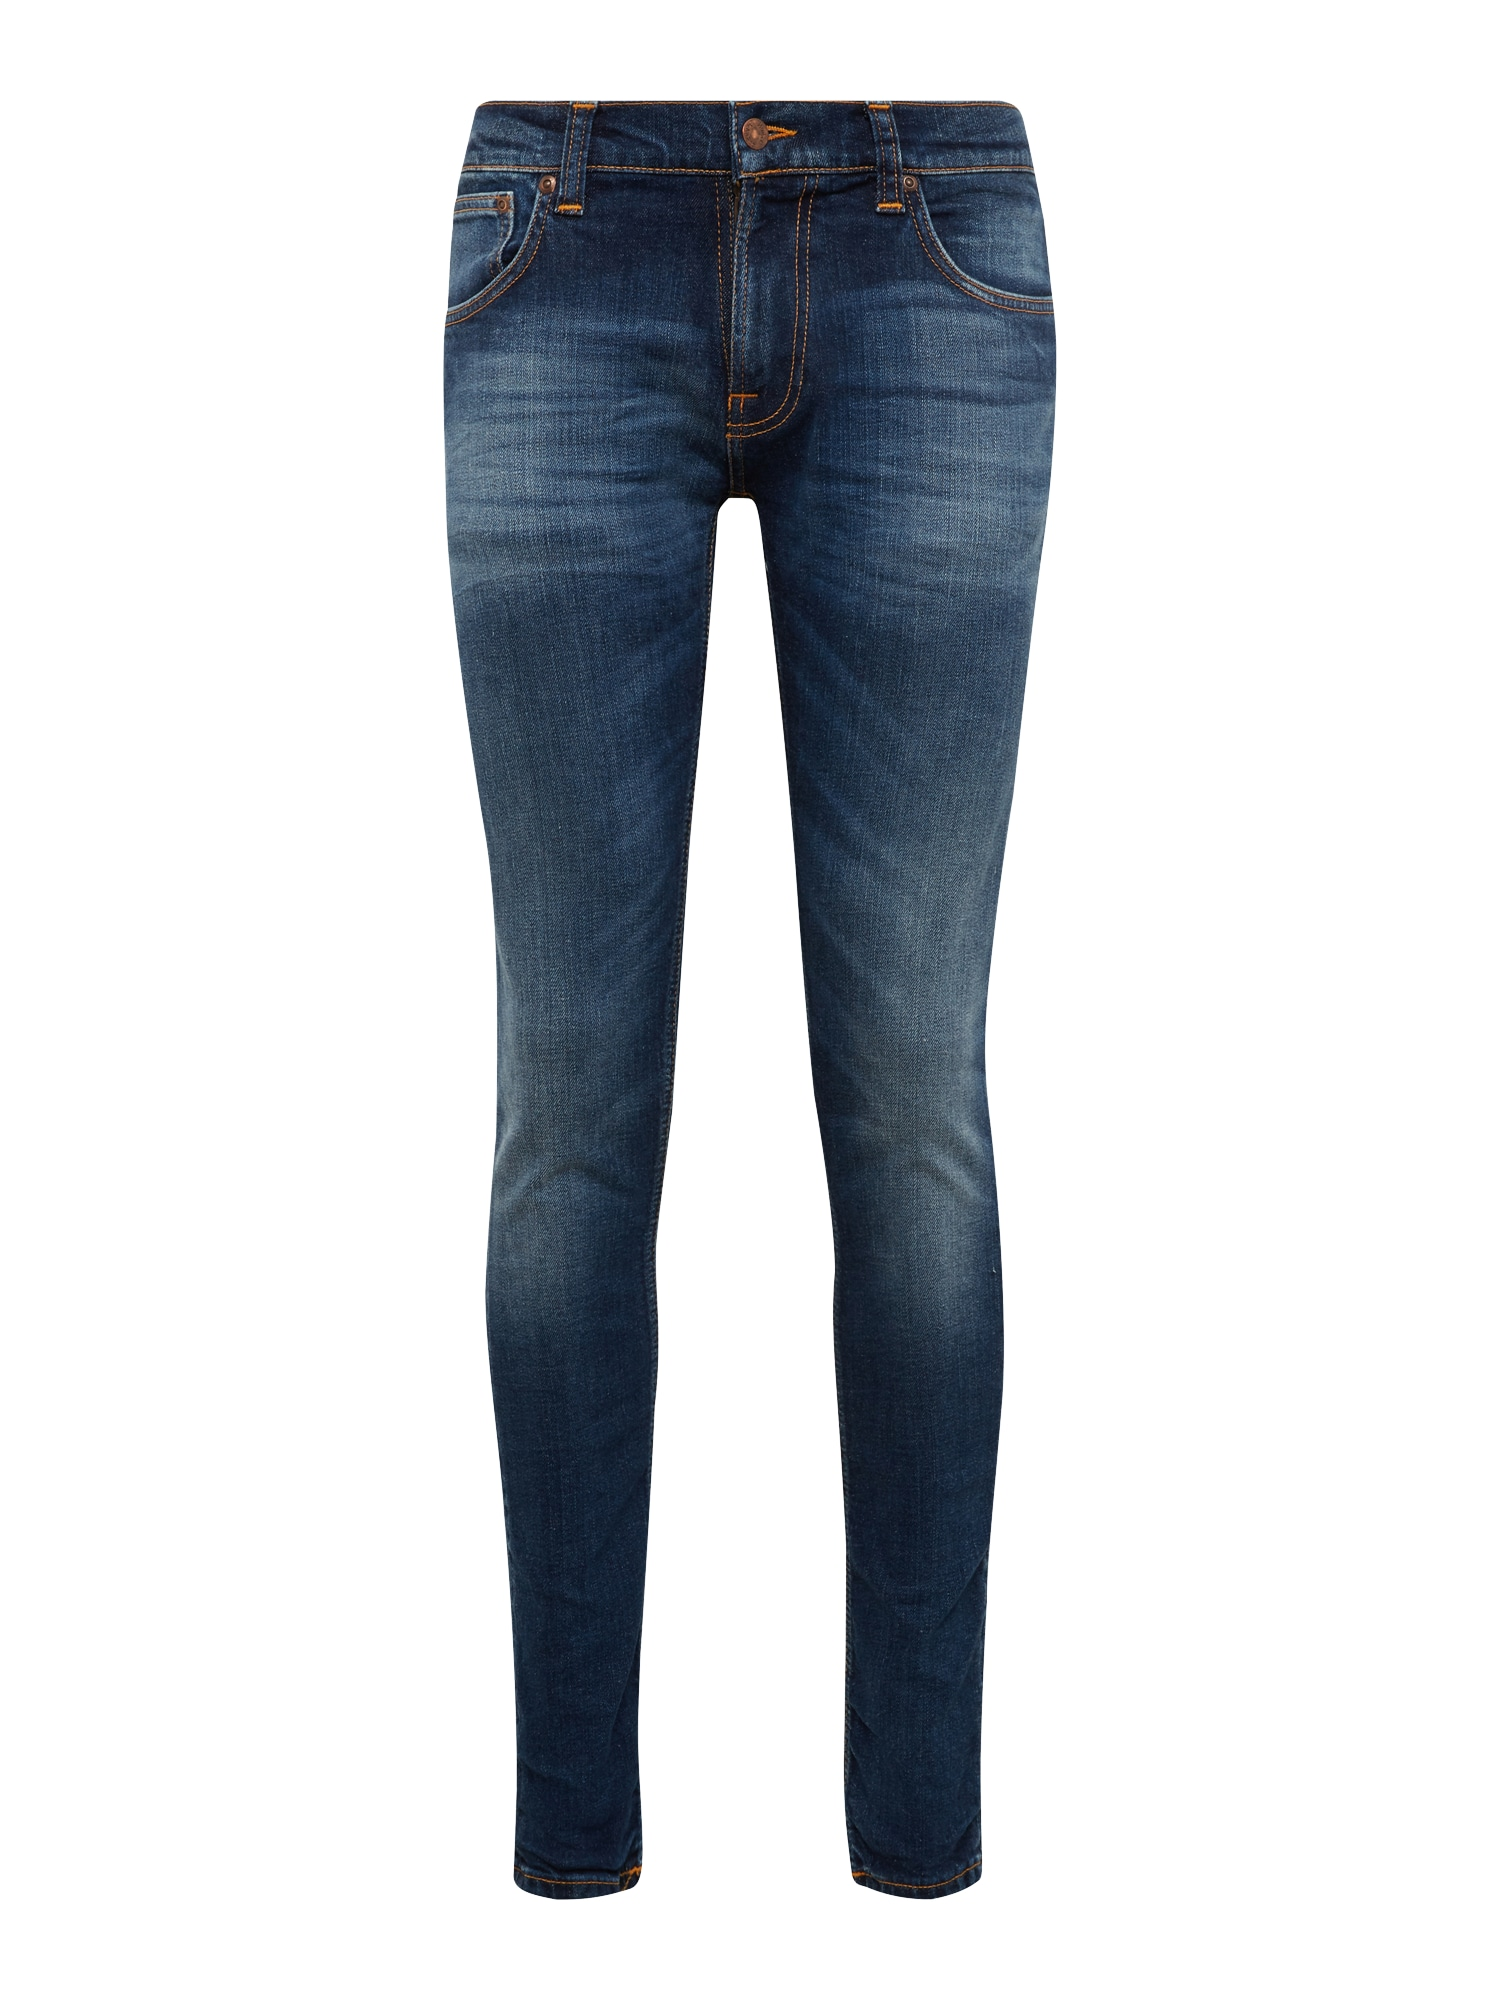 Džíny Tight Terry modrá džínovina Nudie Jeans Co